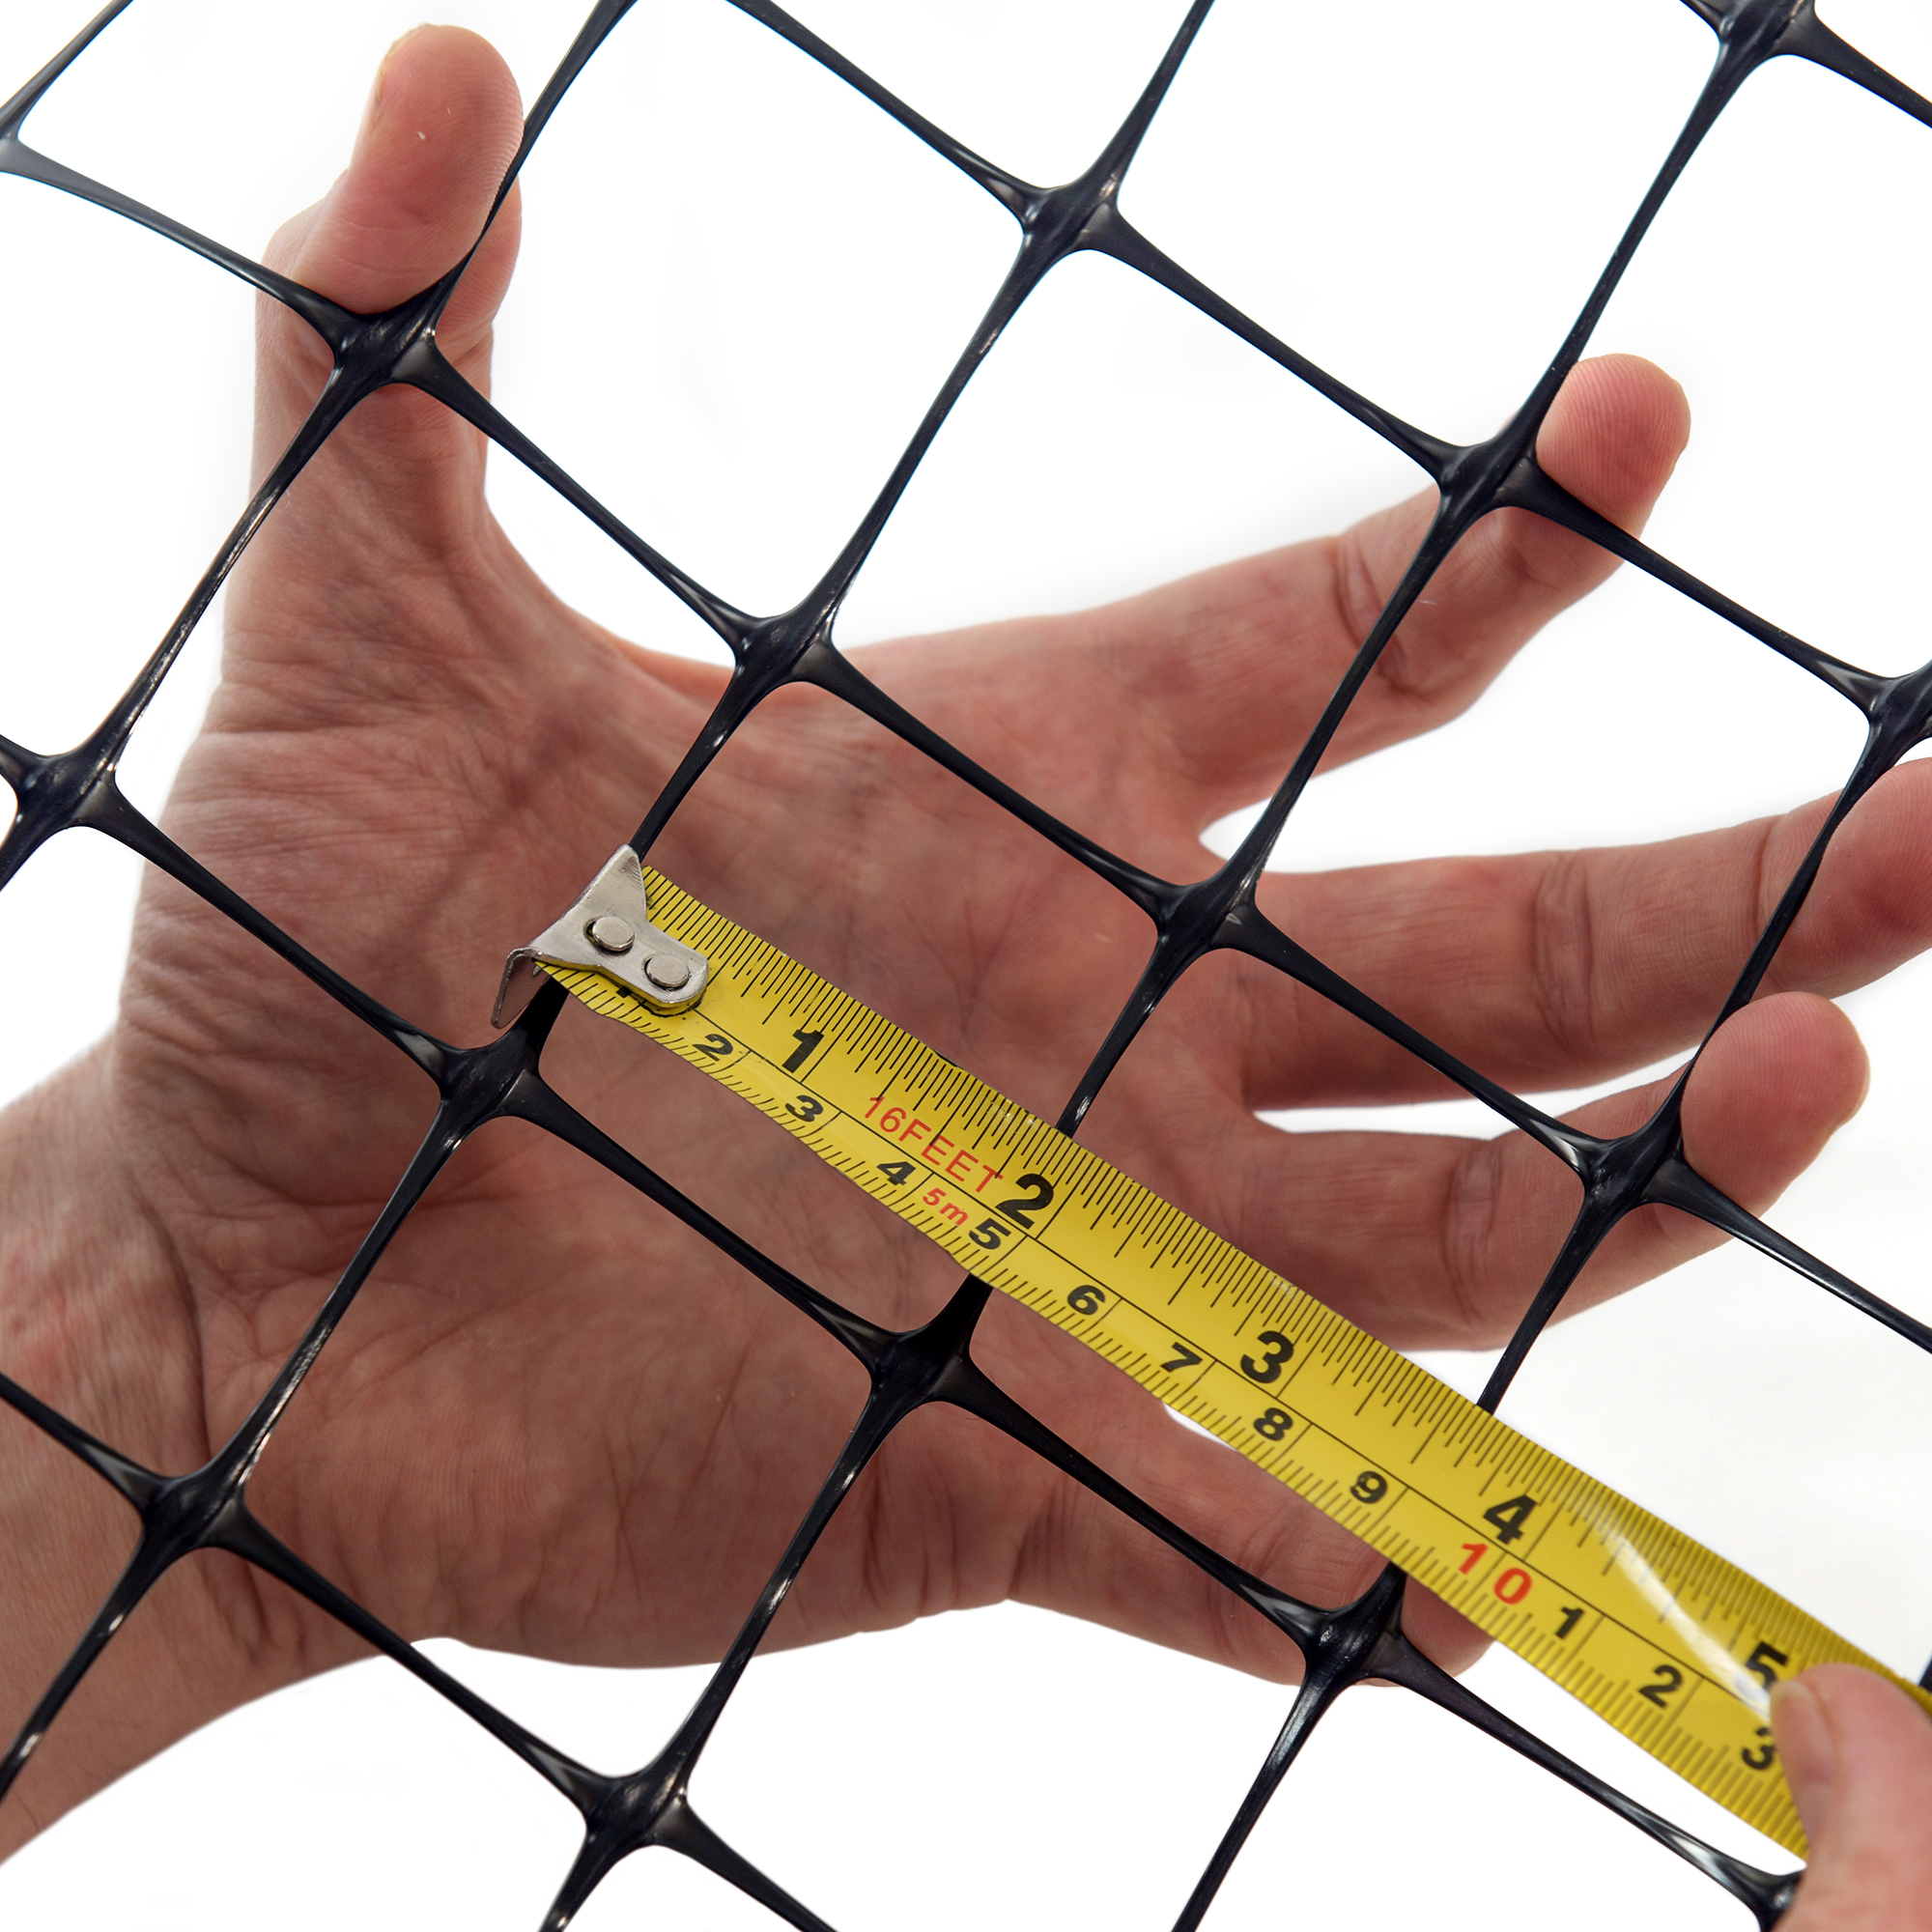 hand-holding-plastic-deer-fence